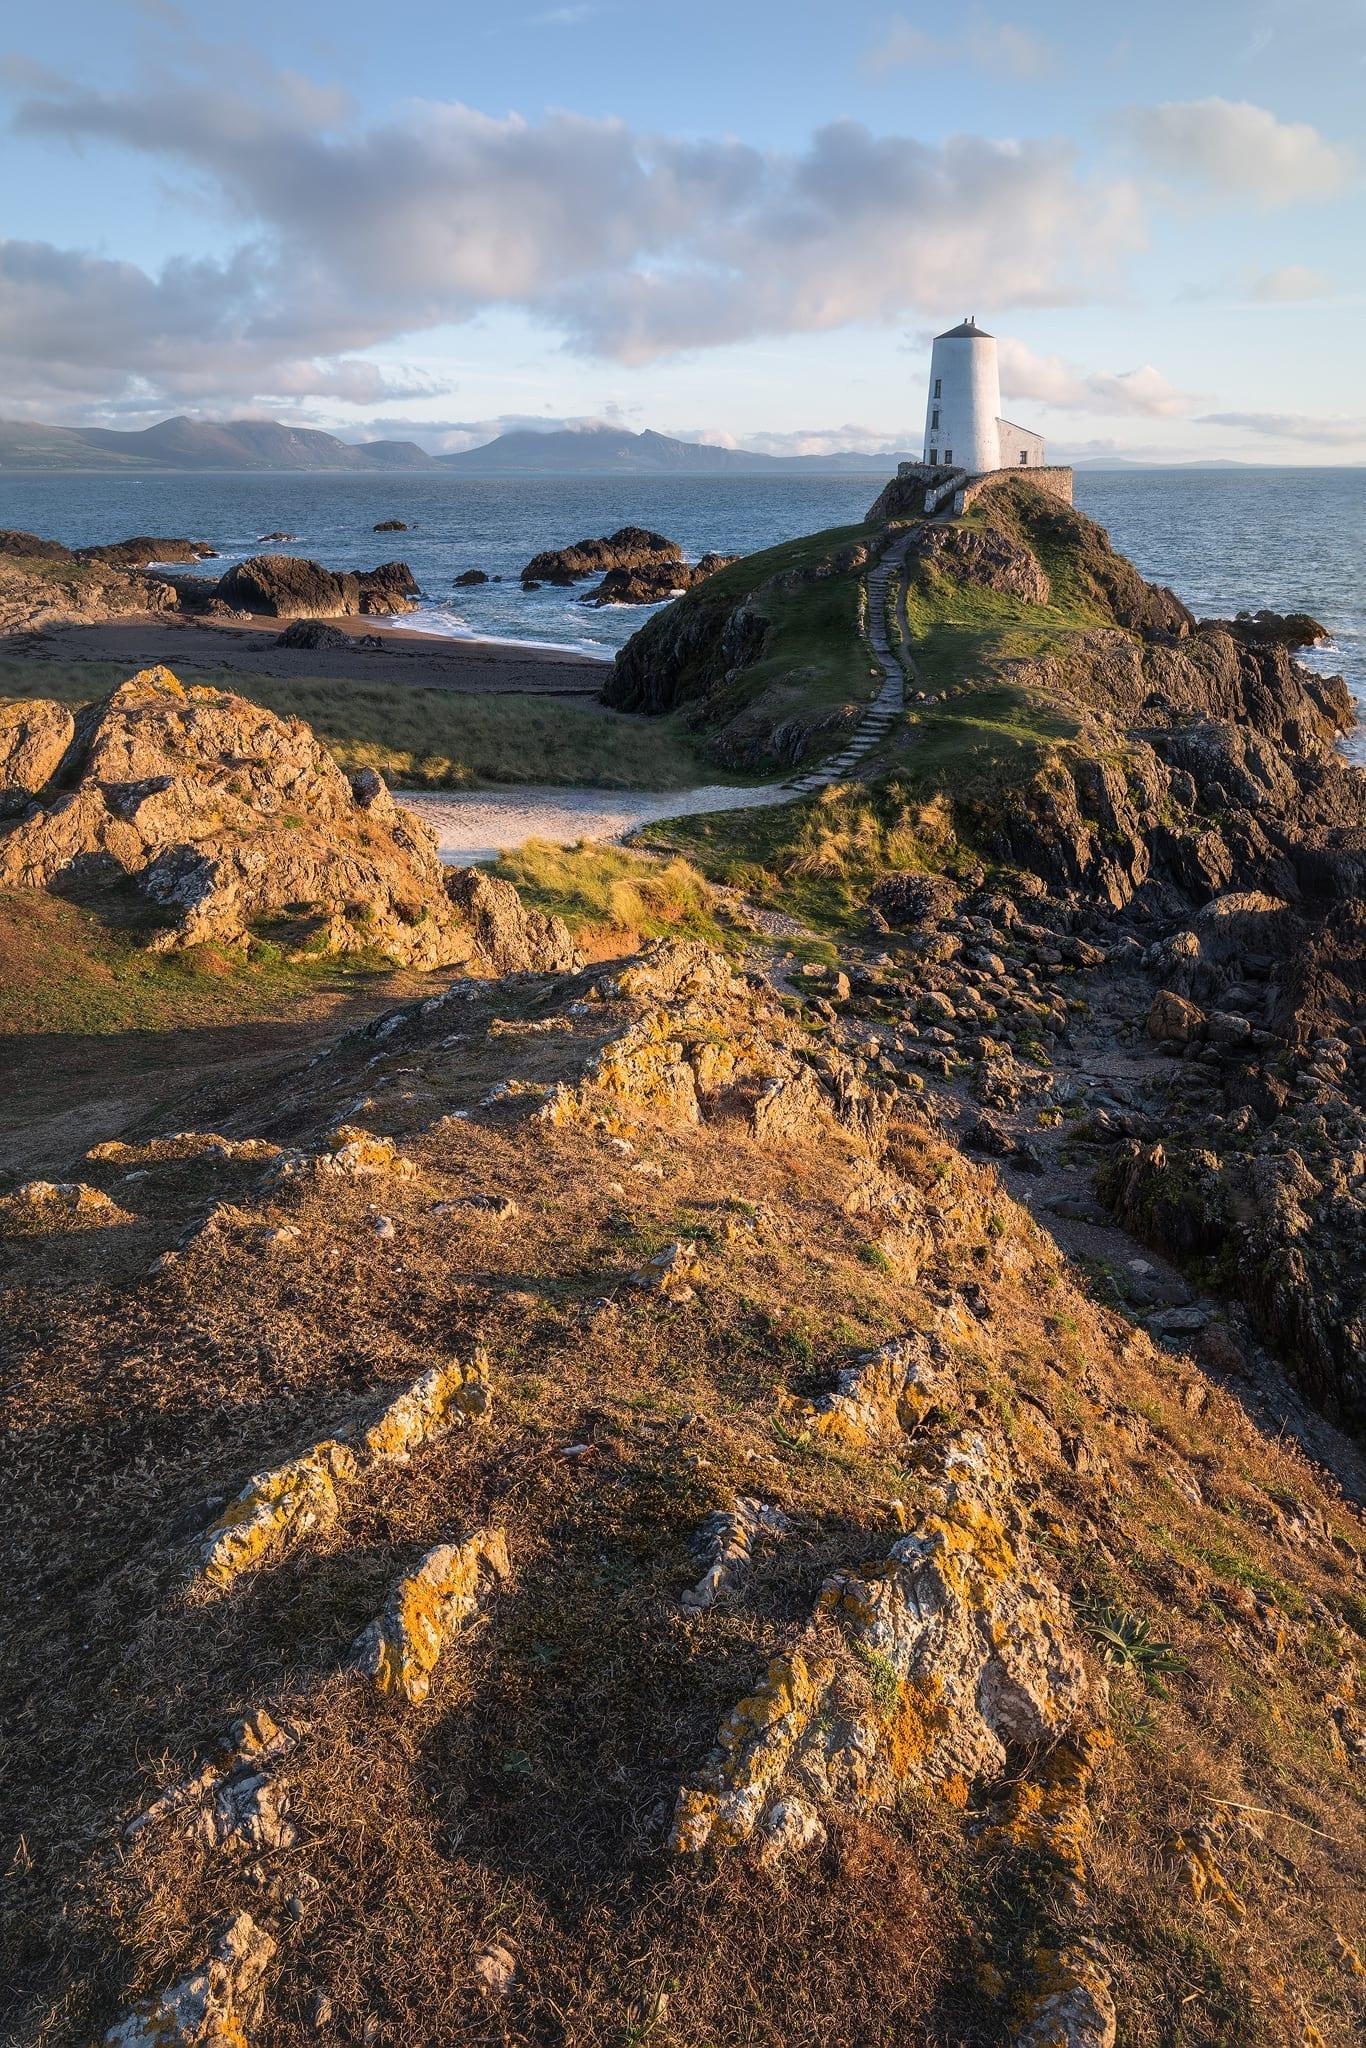 Twr Mawr Lighthouse - Wales Landscape Photography